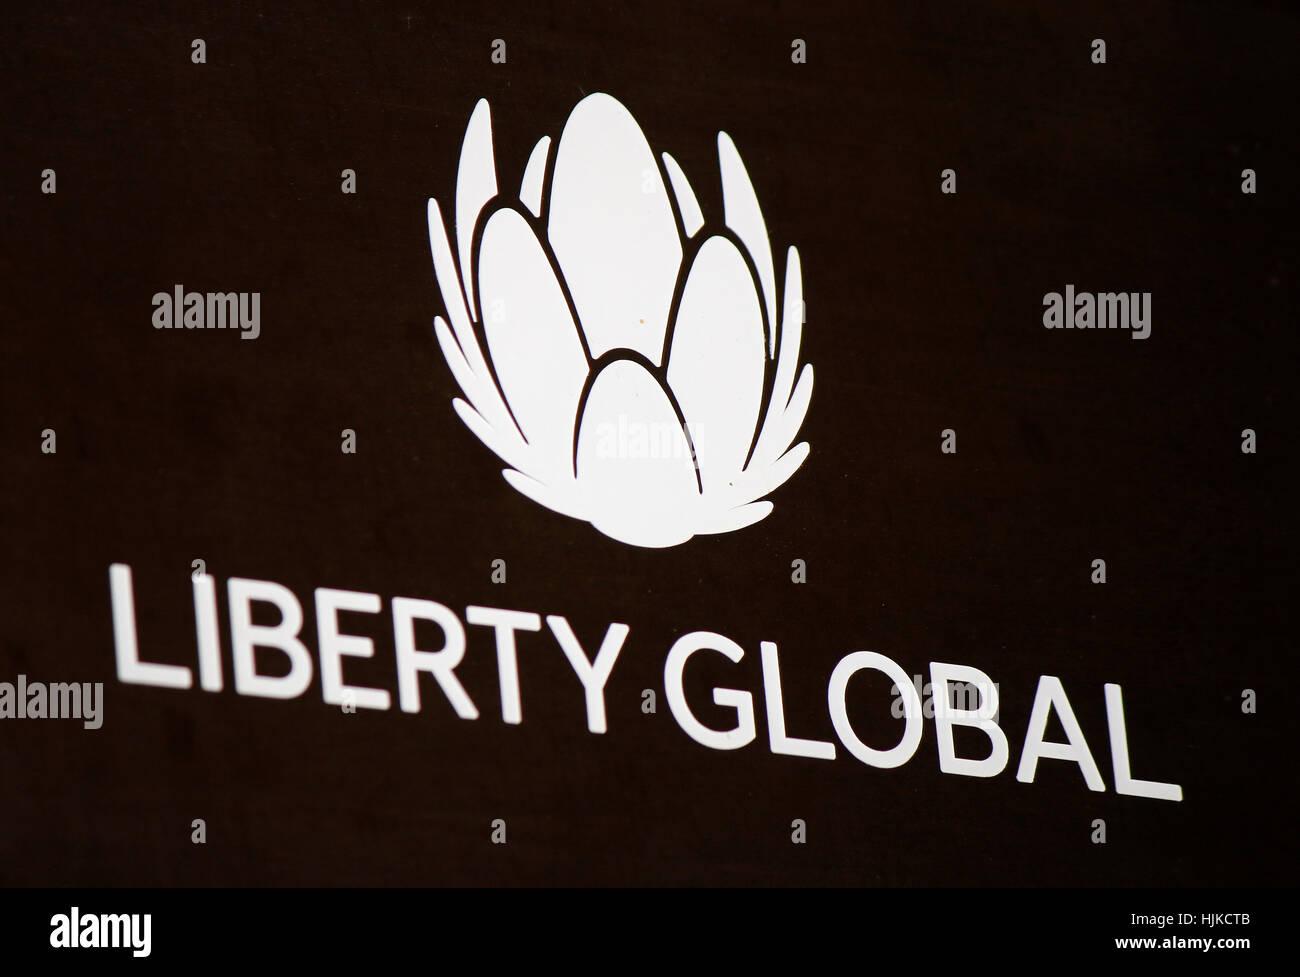 das Logo der Marke 'Liberty Global', Berlin. - Stock Image